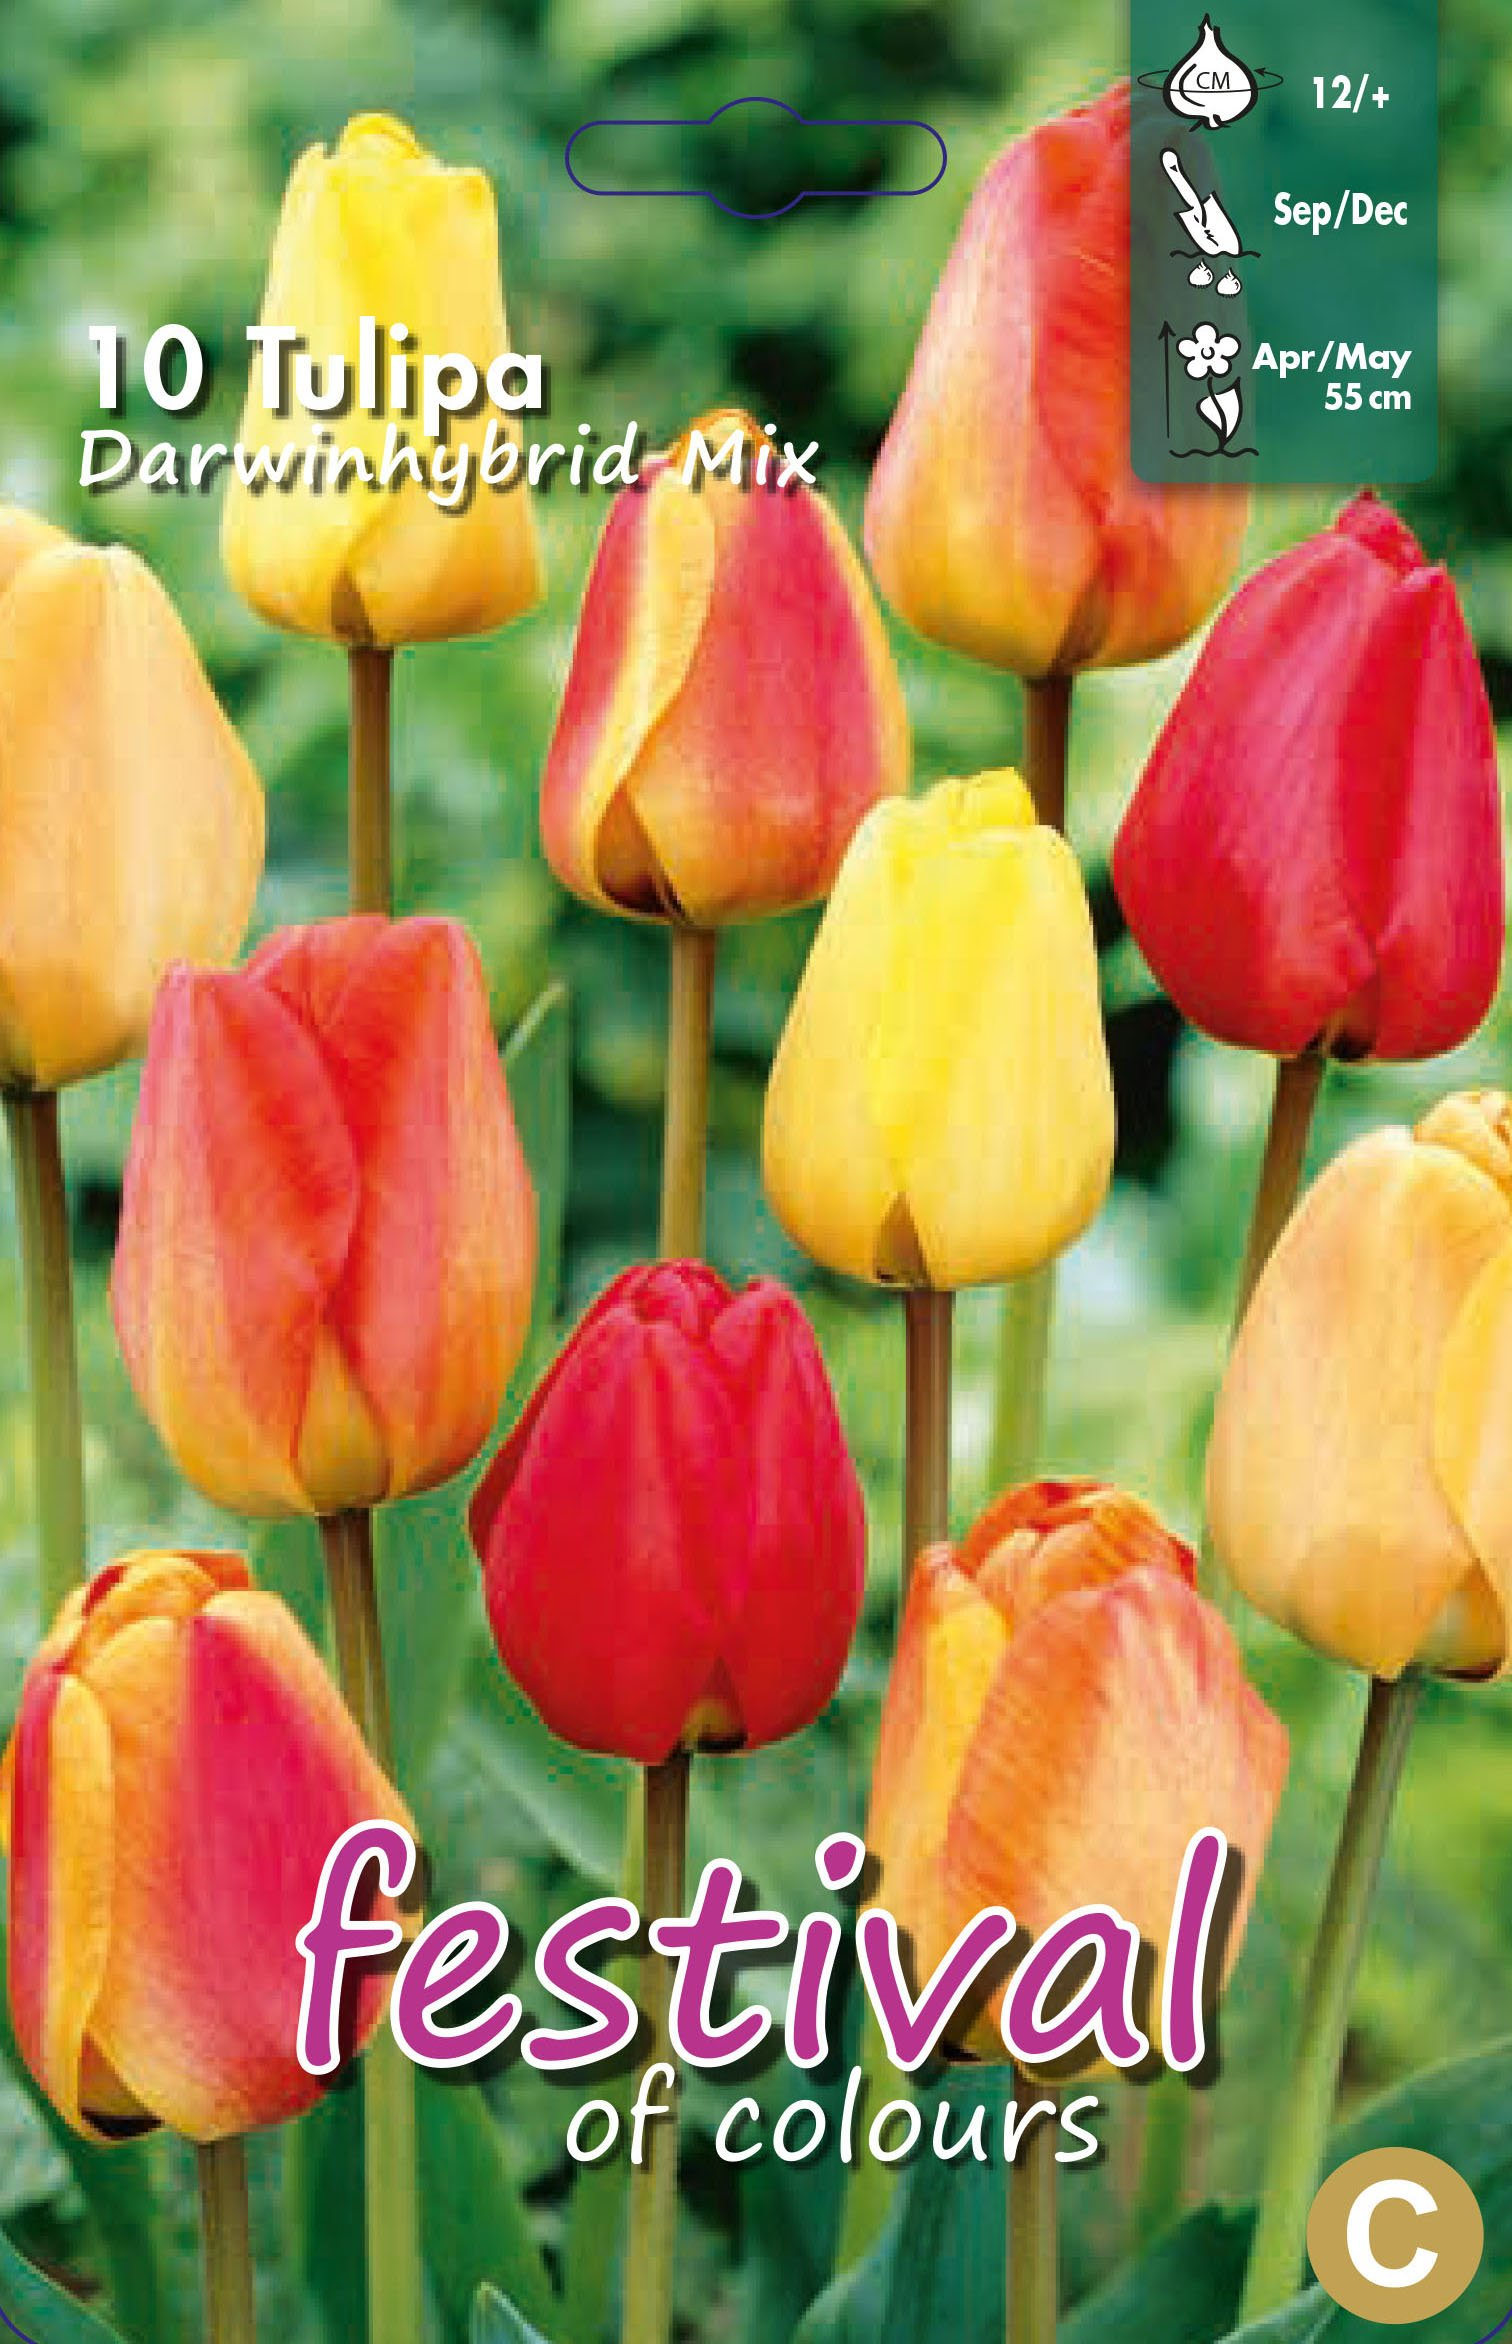 Tulipa Darwinhybrid Mix 10 stk